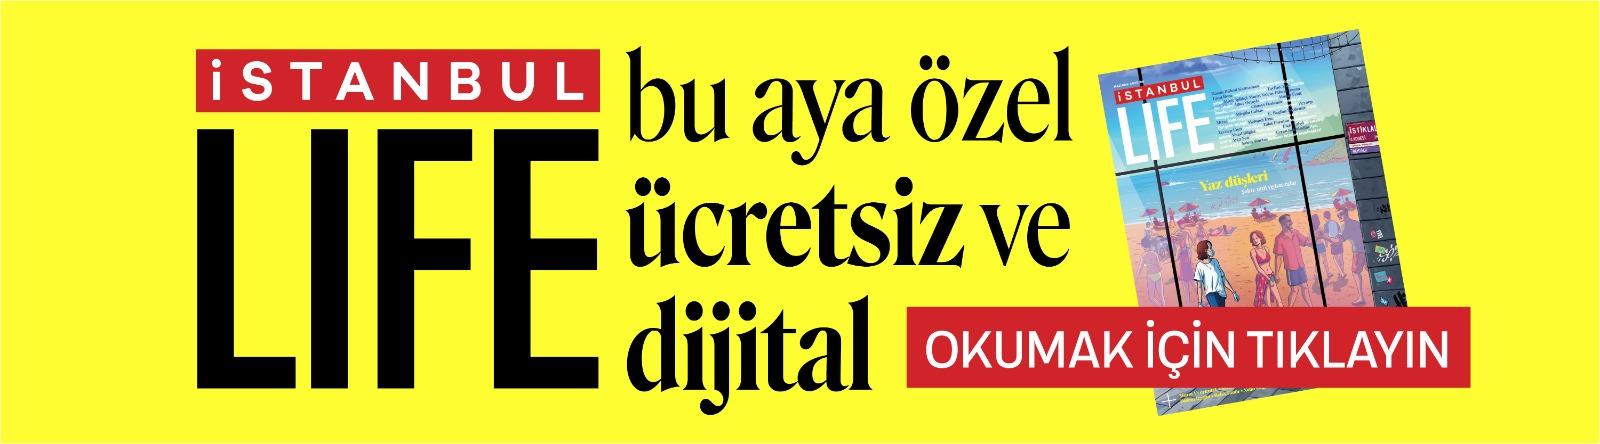 istanbul life haziran sayısı ücretsiz